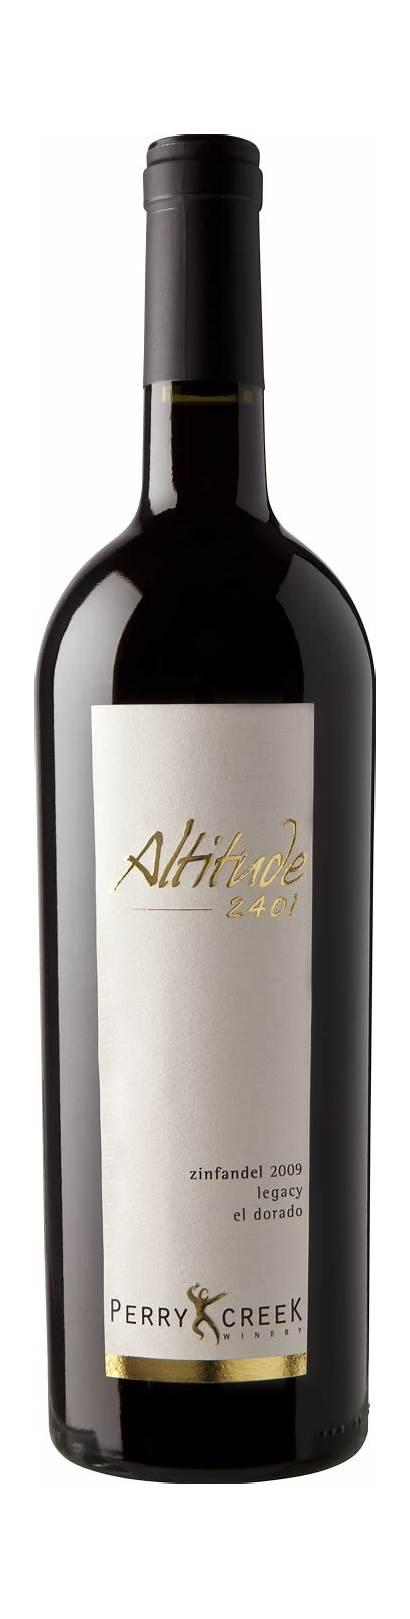 Perry Creek Altitude Winery Zinfandel Wine 2401